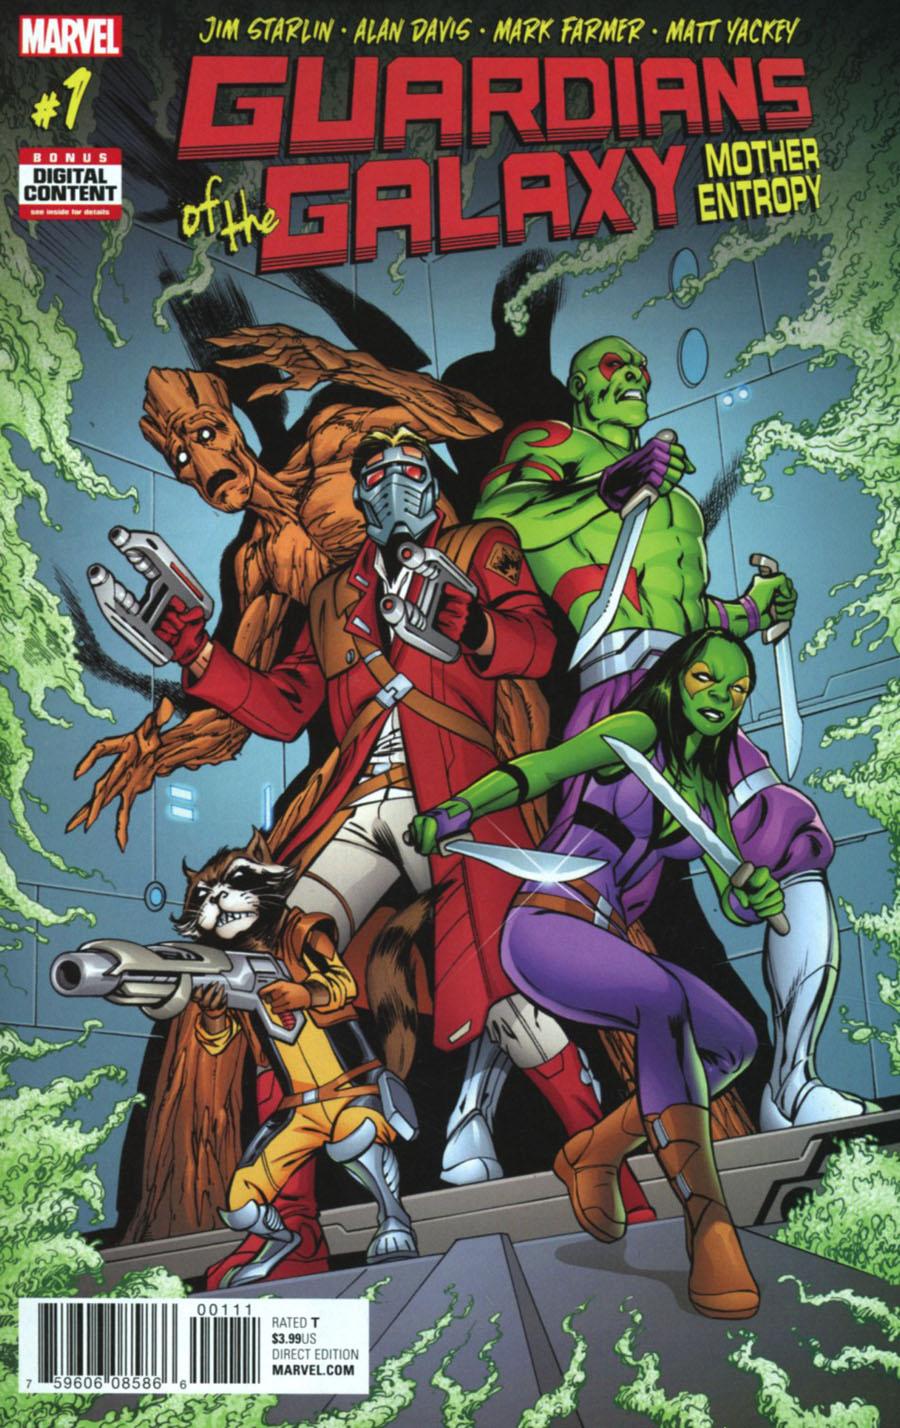 Guardians Of The Galaxy Mother Entropy #1 Cover A Regular Alan Davis Cover